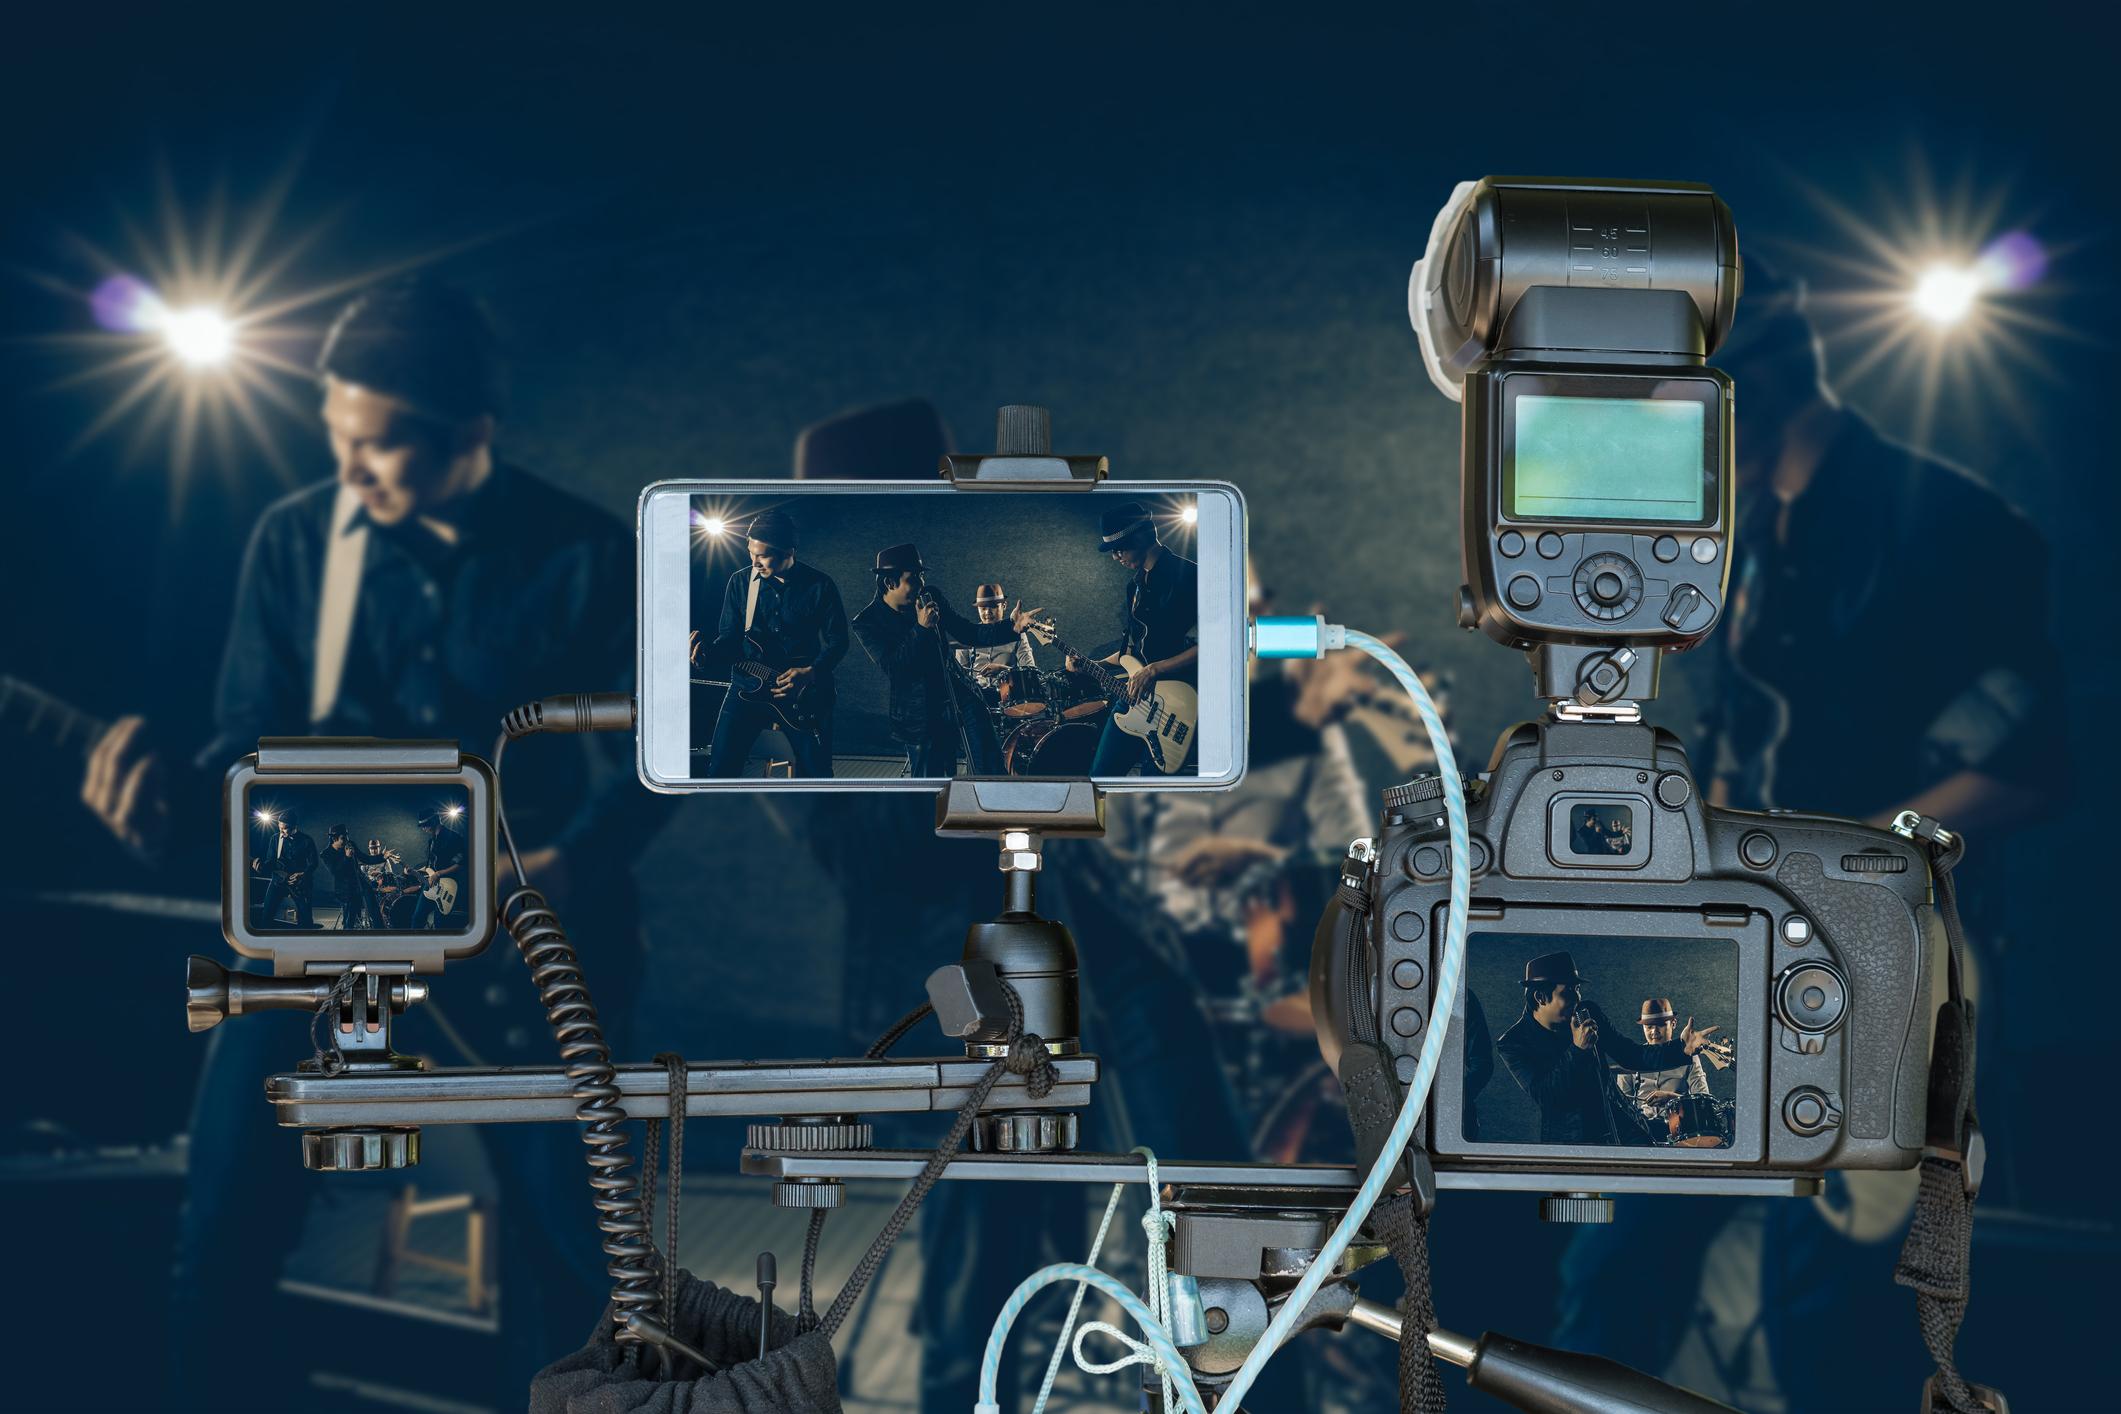 10 Best DSLR Camera Monitors in 2019